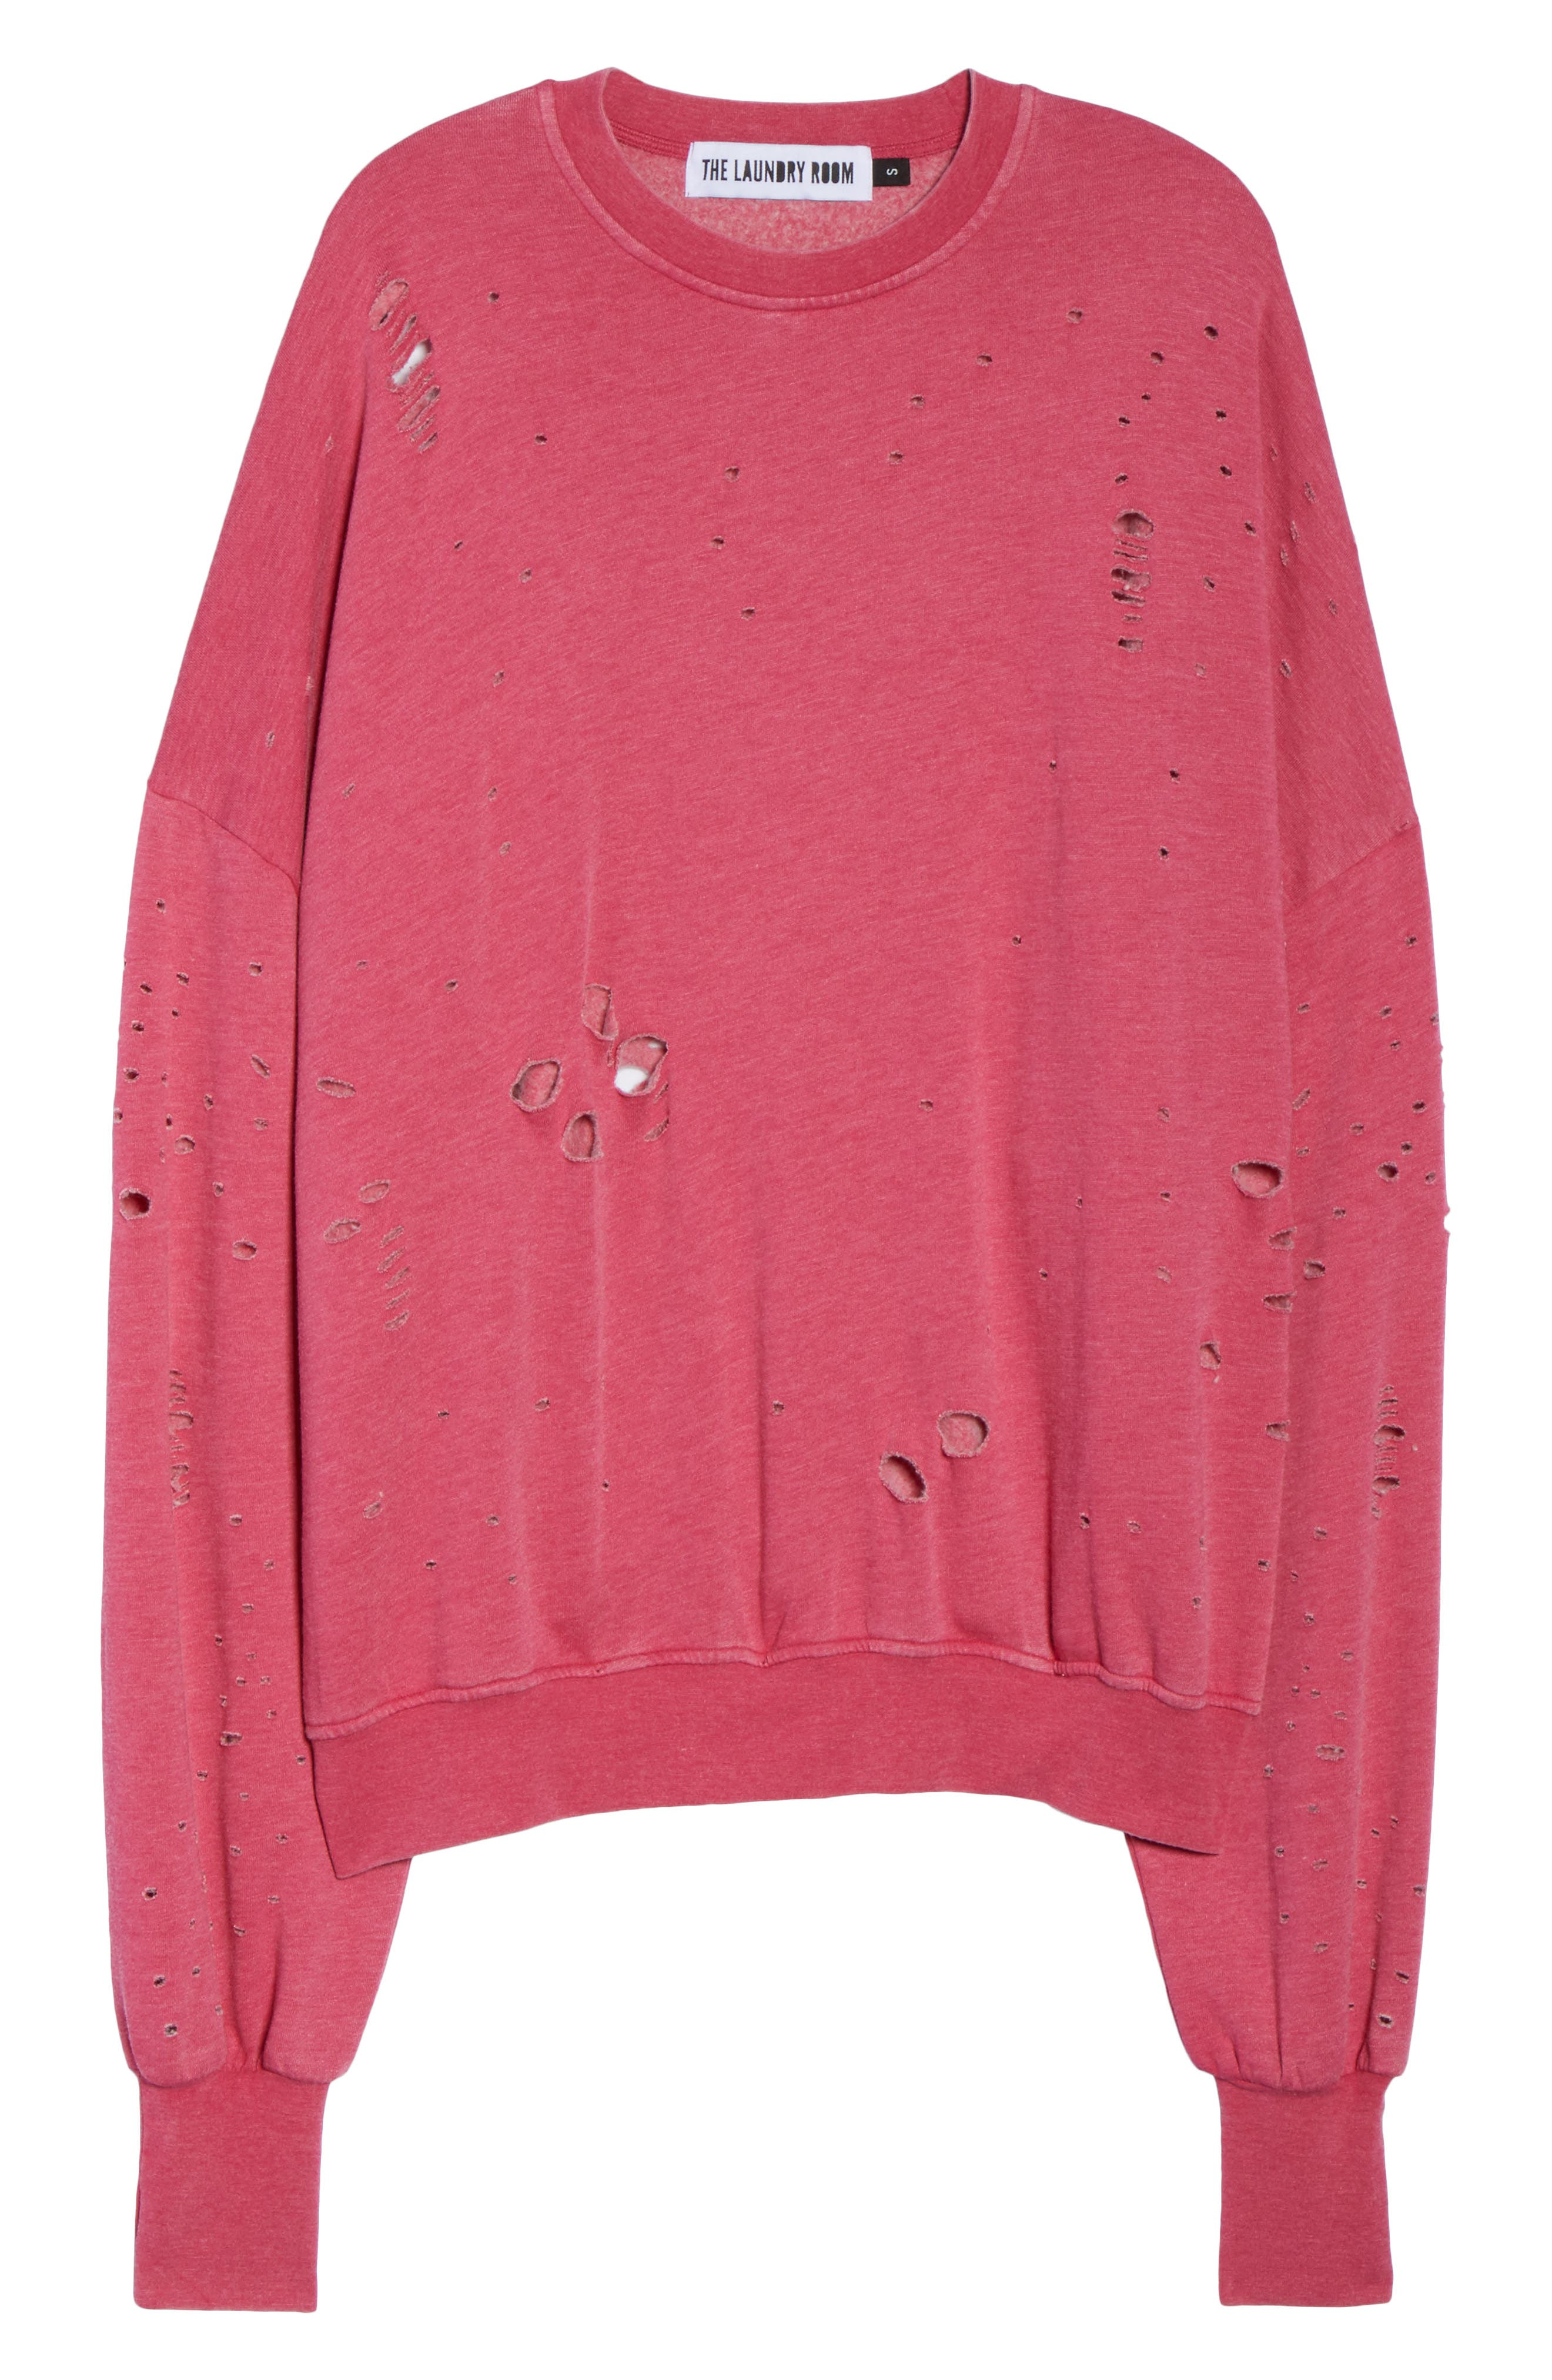 Thrasher Sweatshirt,                             Alternate thumbnail 12, color,